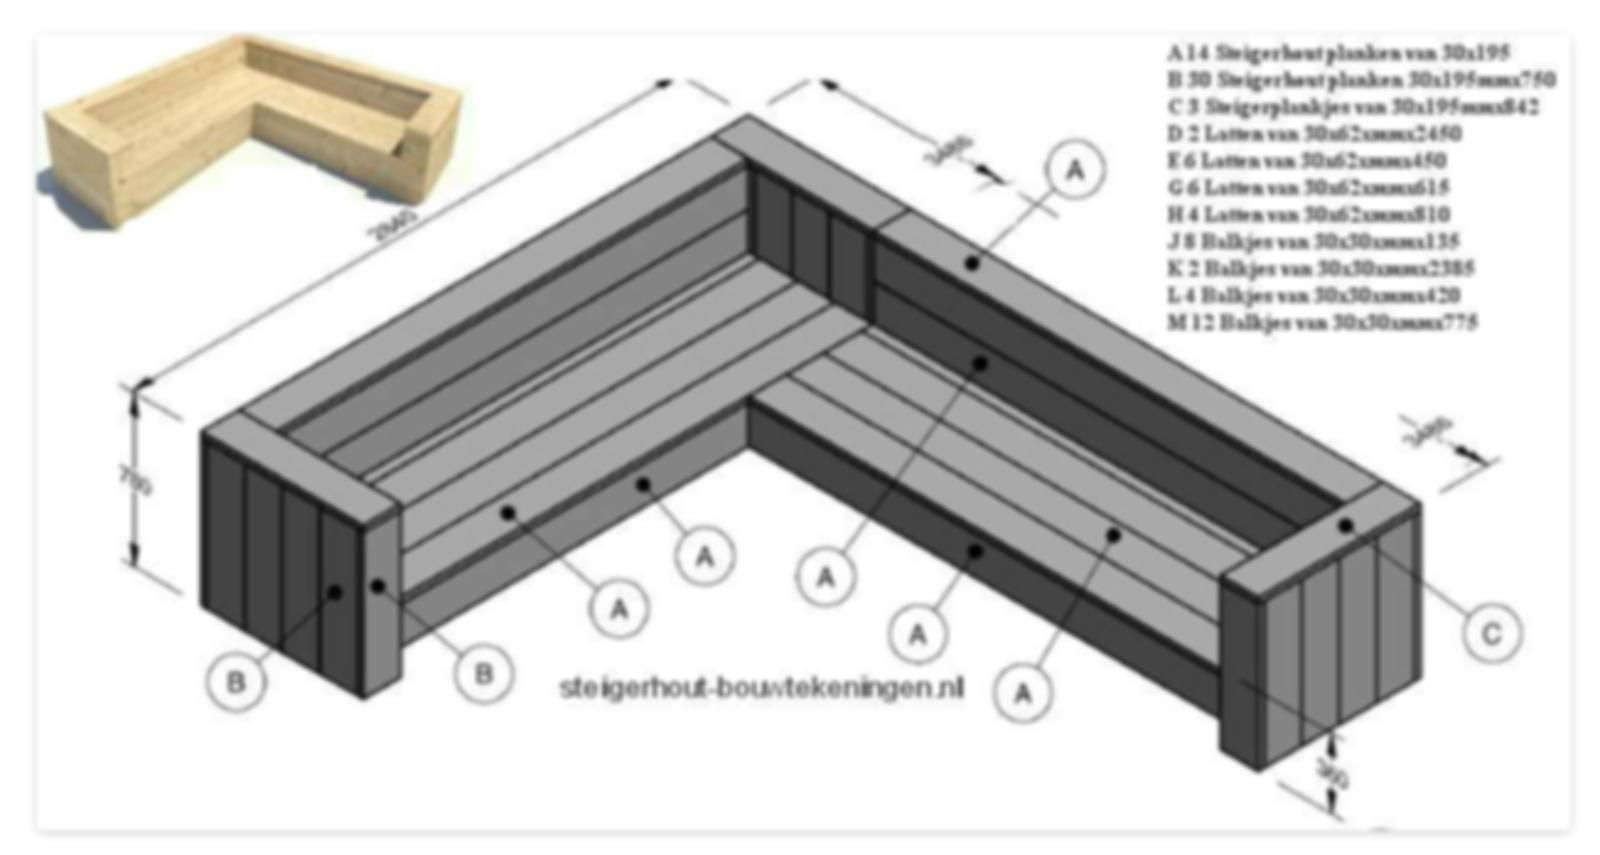 Zeer hoekbank steigerhout | voordemakers.nl BE74